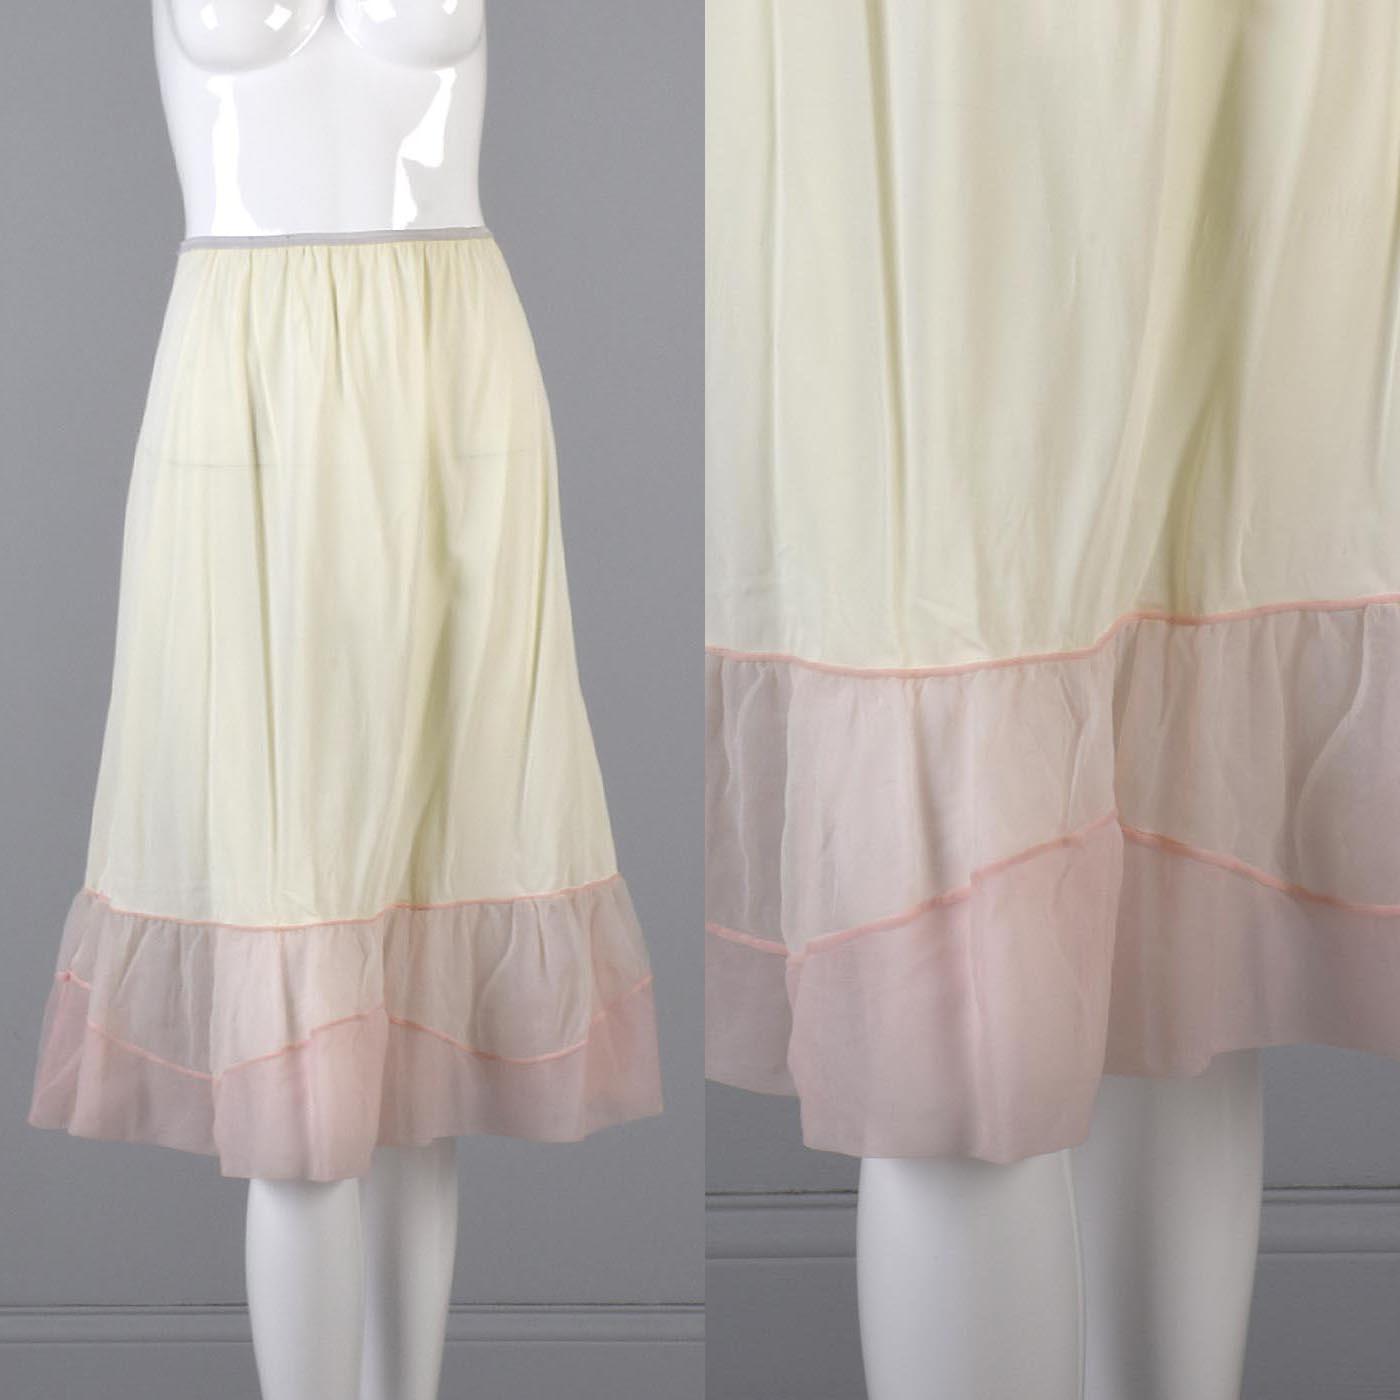 2c2f4b8819 Details about Medium 1950s Pink Cream Half Slip Vintage Skirt 50s Petticoat  Sheer Loungewear